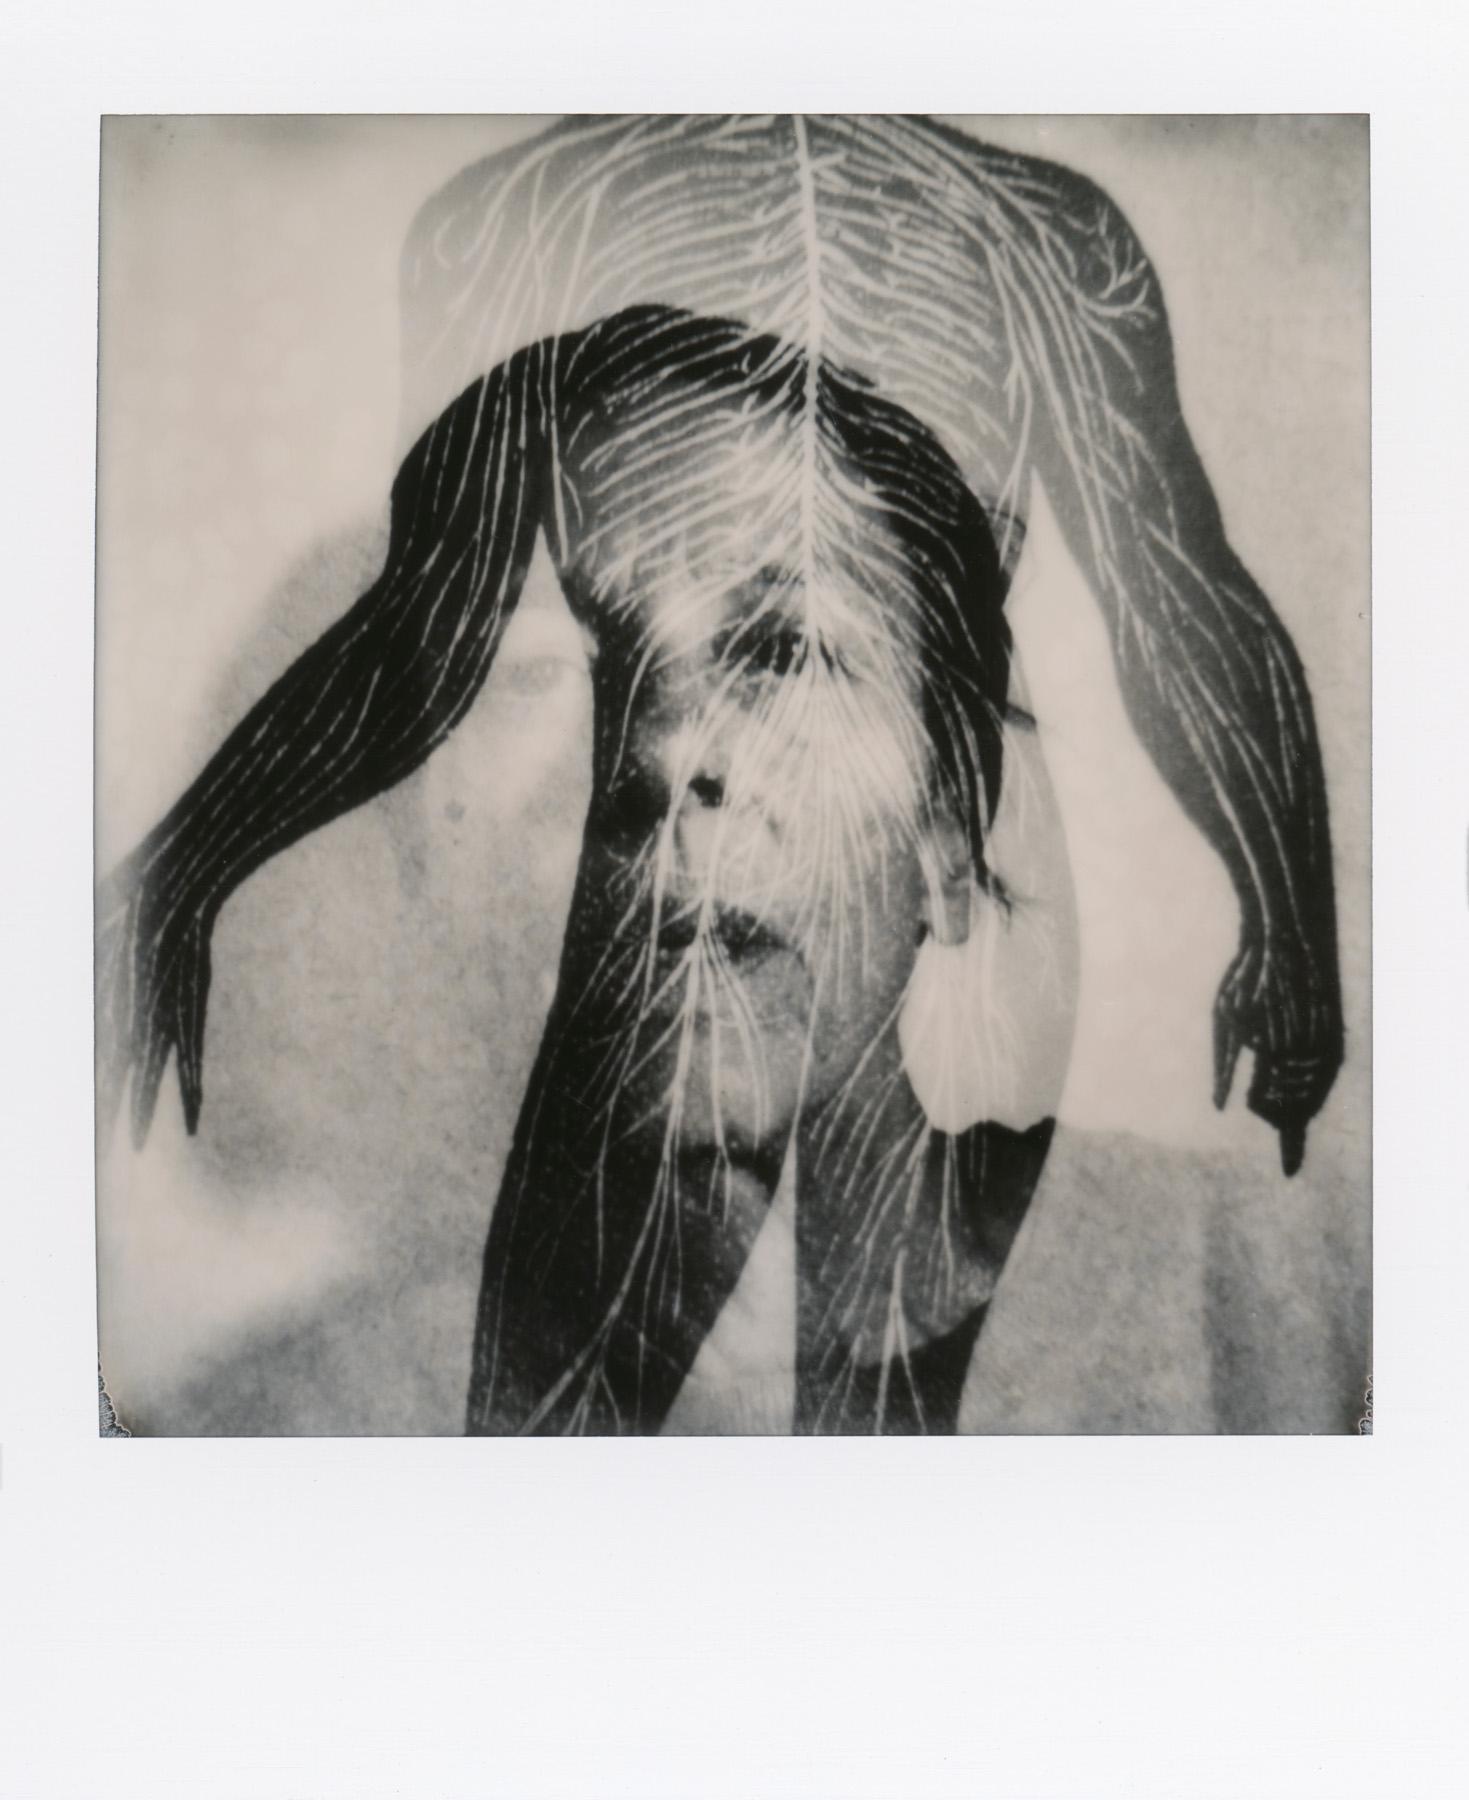 Untitled | SX-70 | Alek Lindus